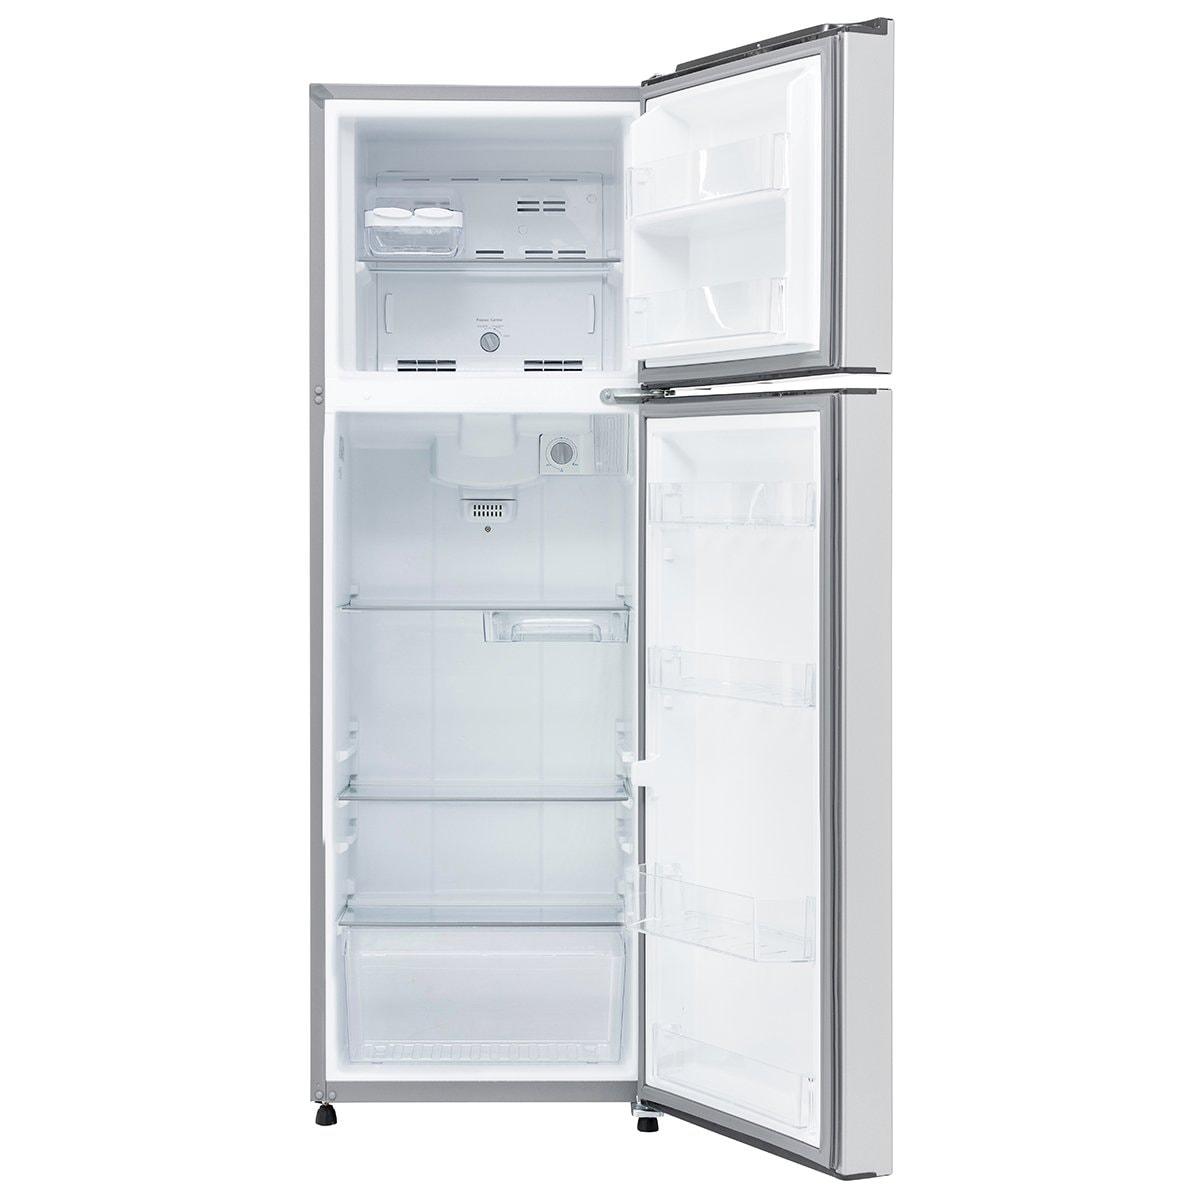 Refrigerador Whirlpool 2 Puertas 14 P3 Plateado